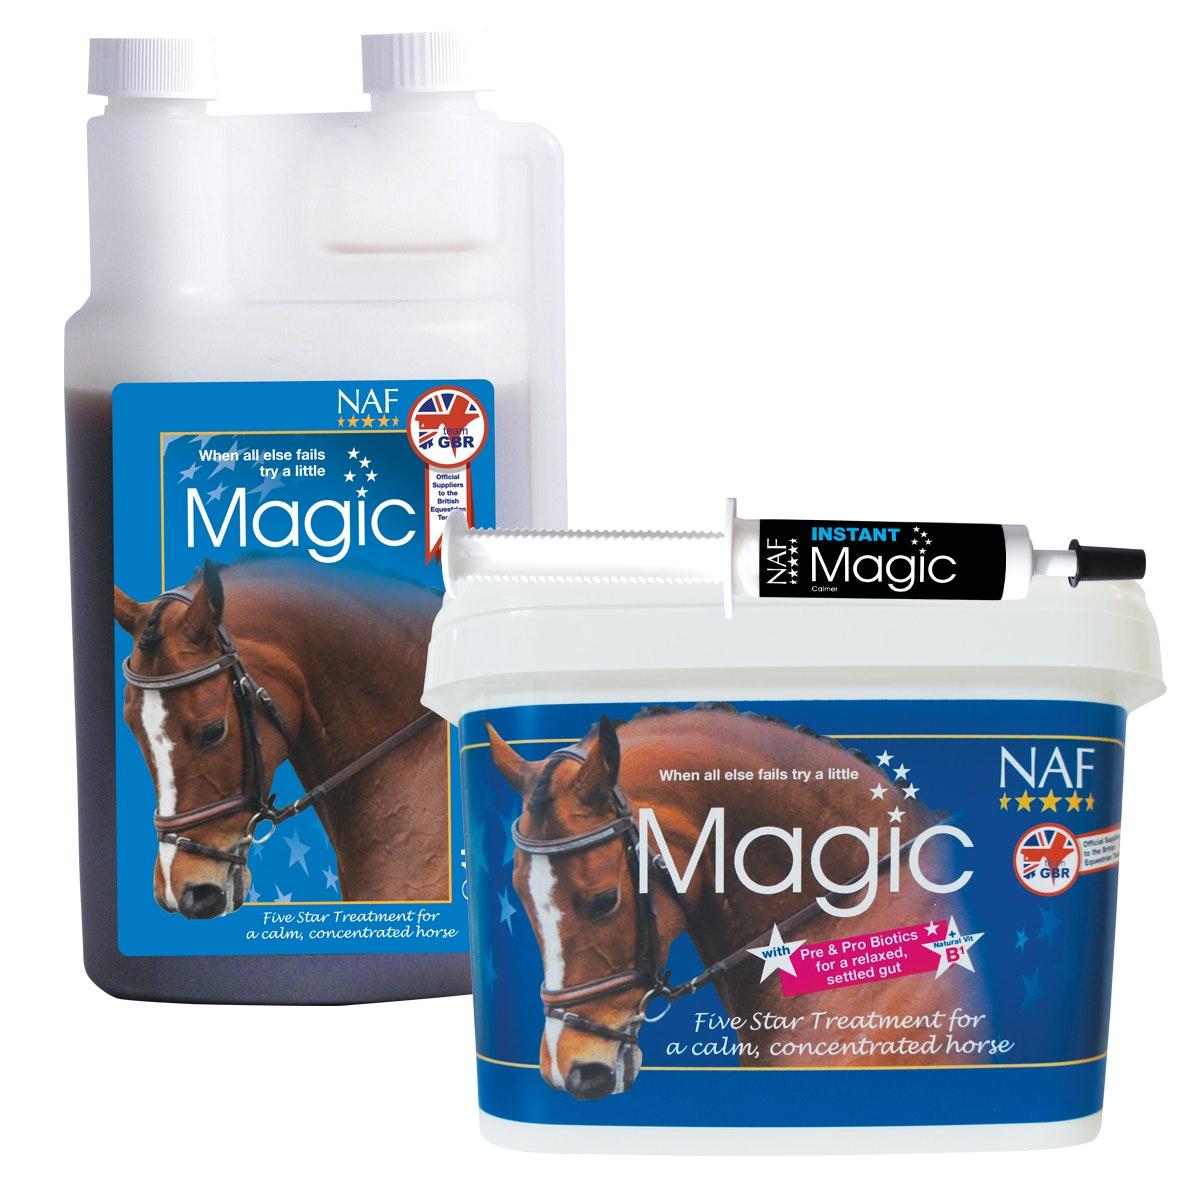 NAF Five Star Magic  sweepstakes